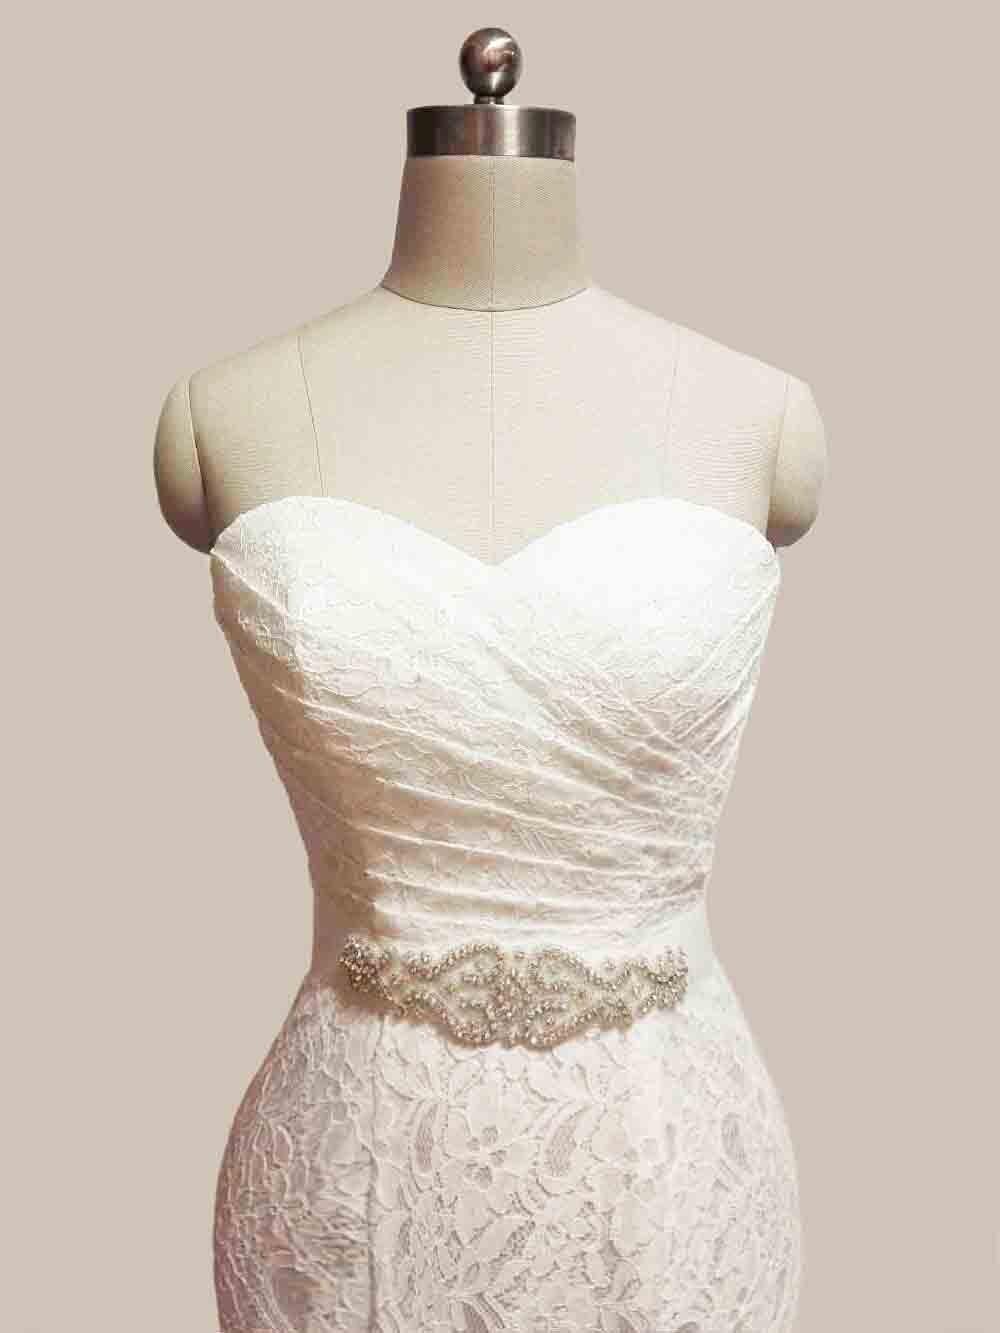 JIERUIZE vestidos de novia White Lace Mermaid Wedding Dresses 2017 Sash Sweetheart Lace Up Back Wedding Gowns abiti da sposa 3